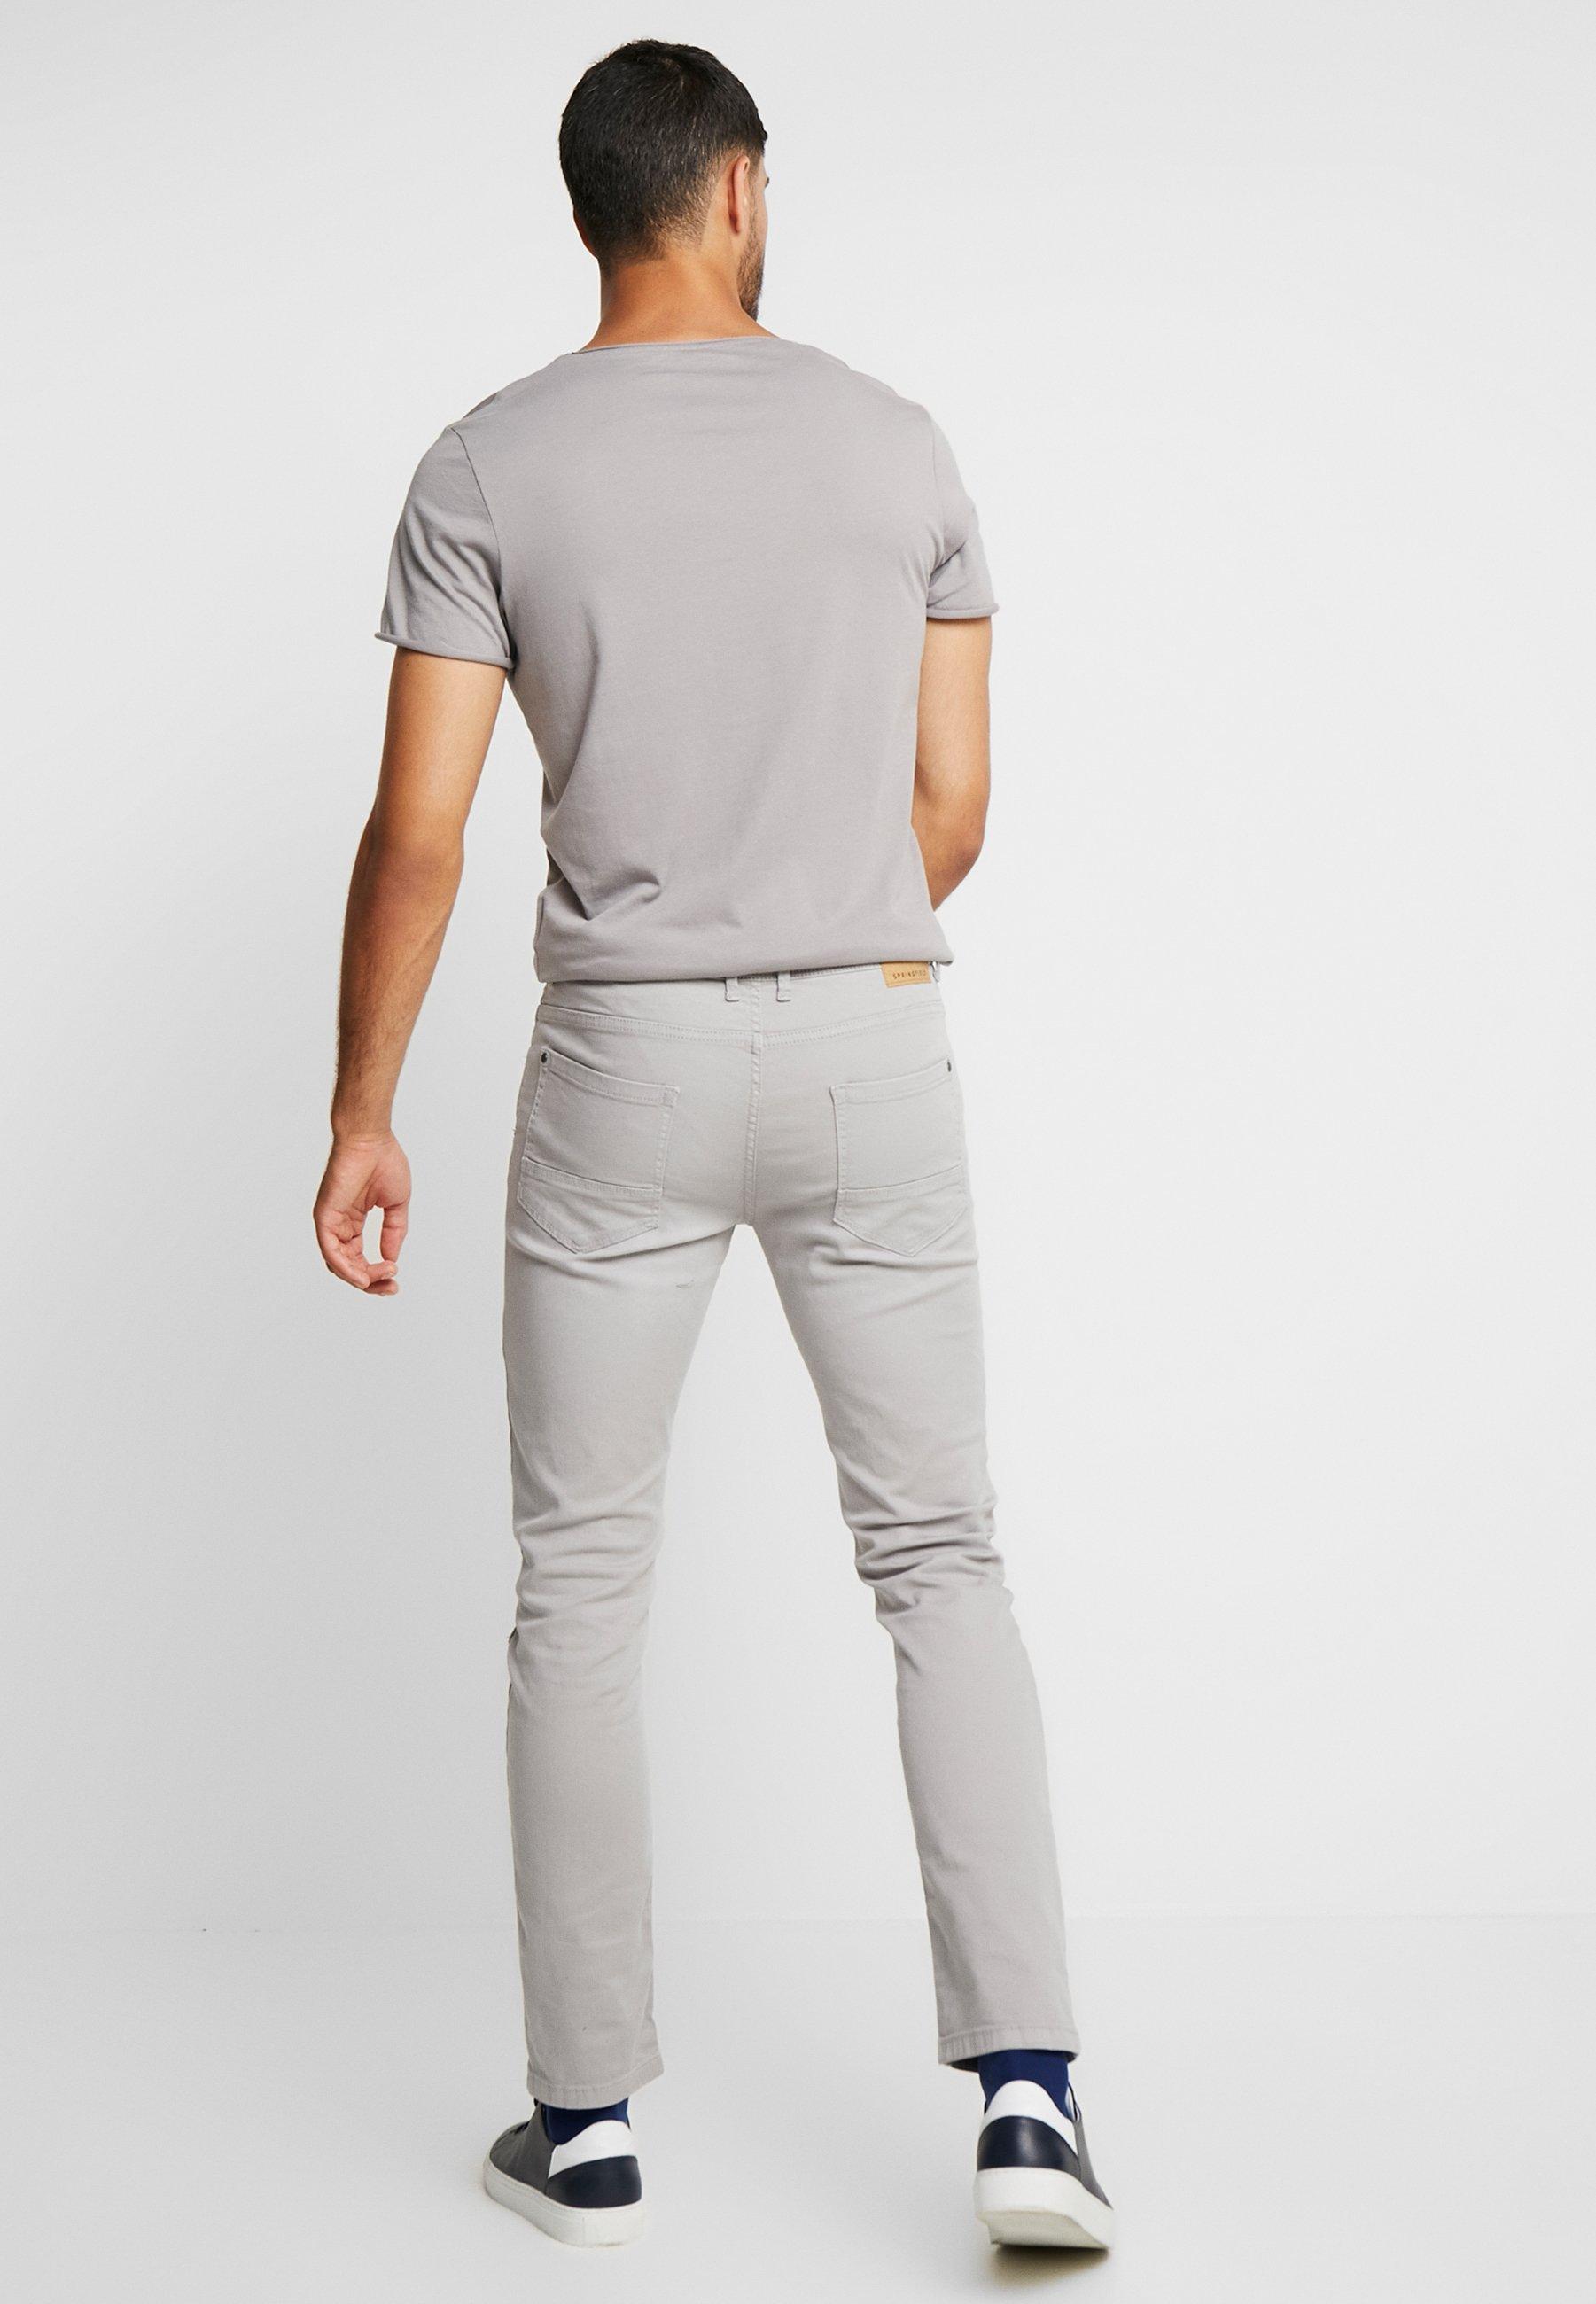 Medium Springfield Grey Slim Comfort stretchJean YIfb7v6gy